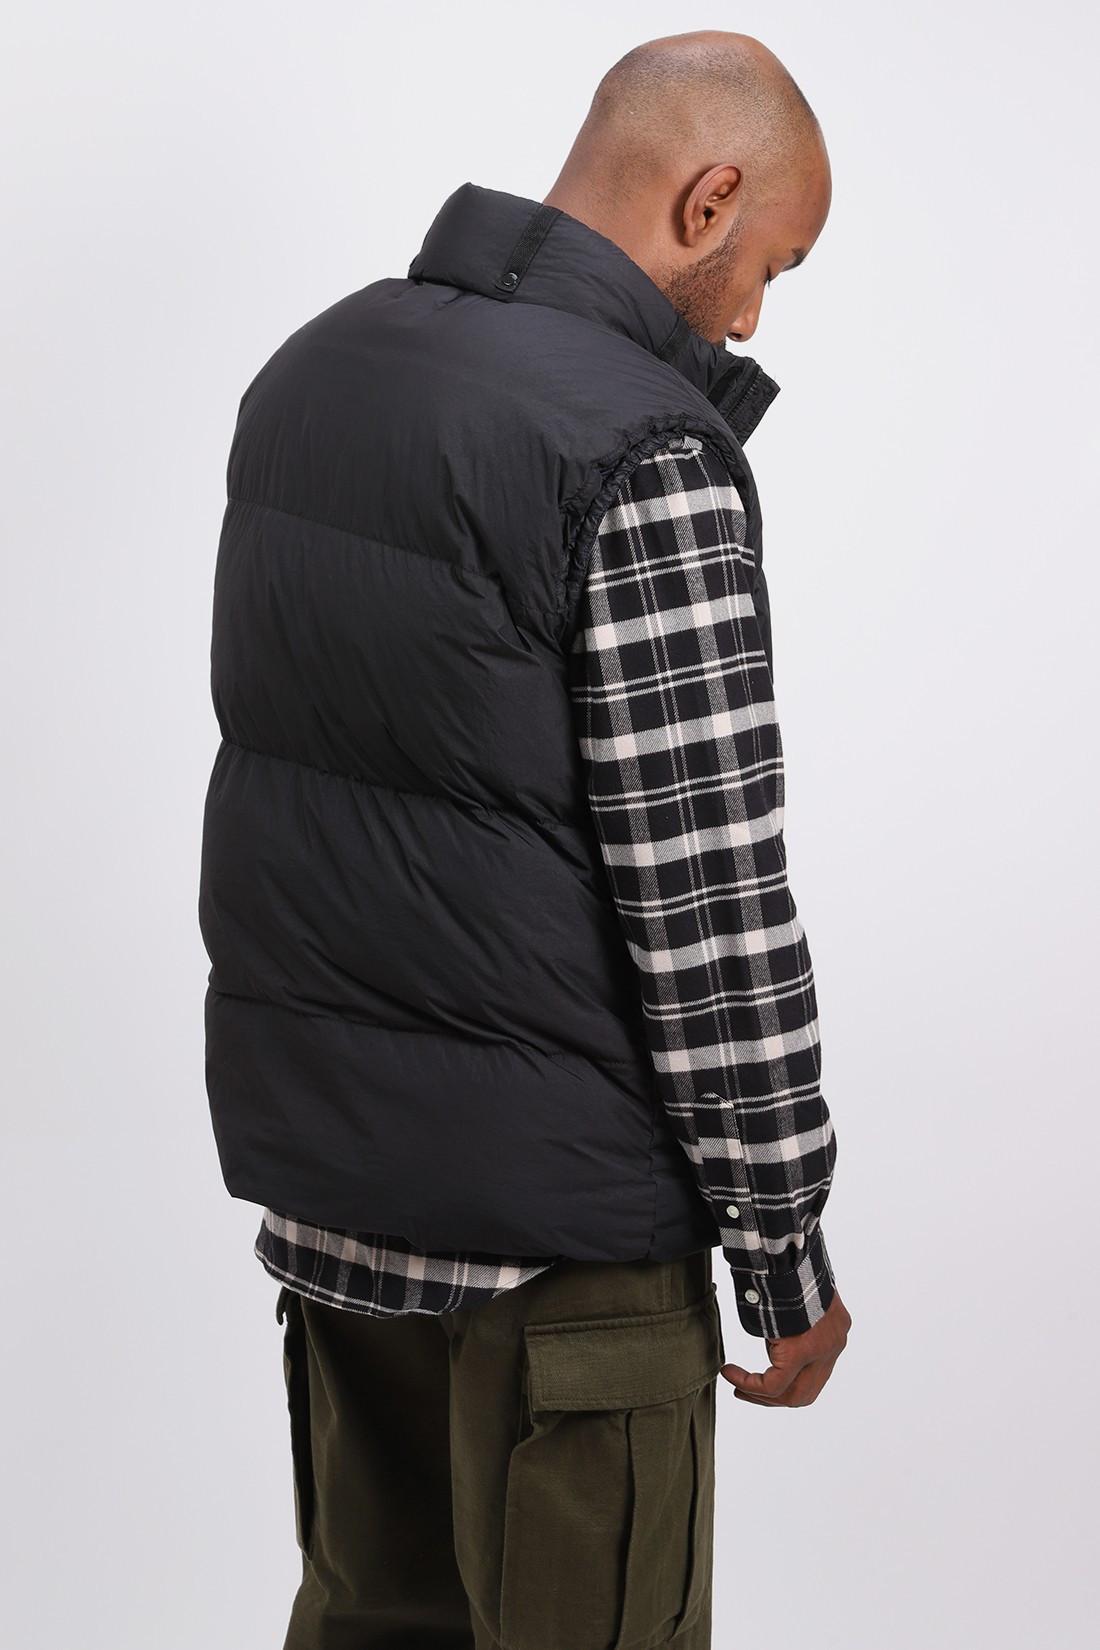 STONE ISLAND / G0123 sleeveless down jacket V0029 nero